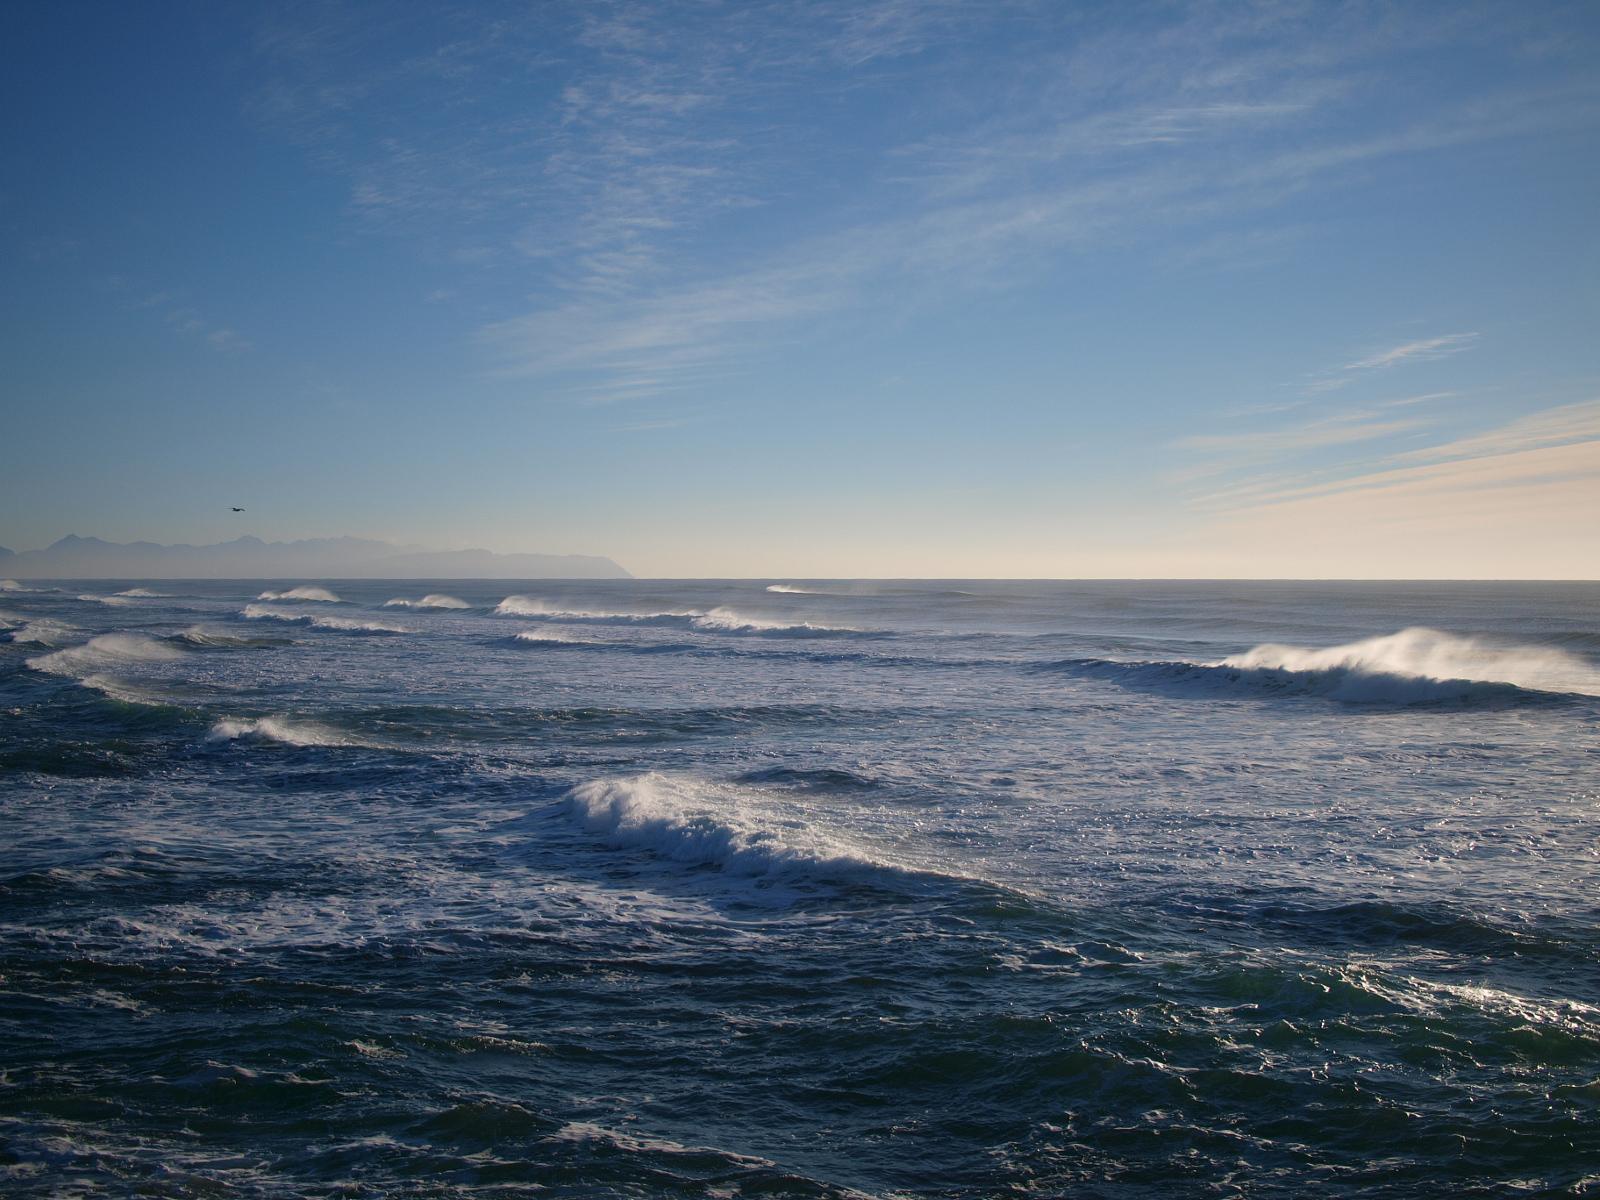 Pacific Ocean in Oregon